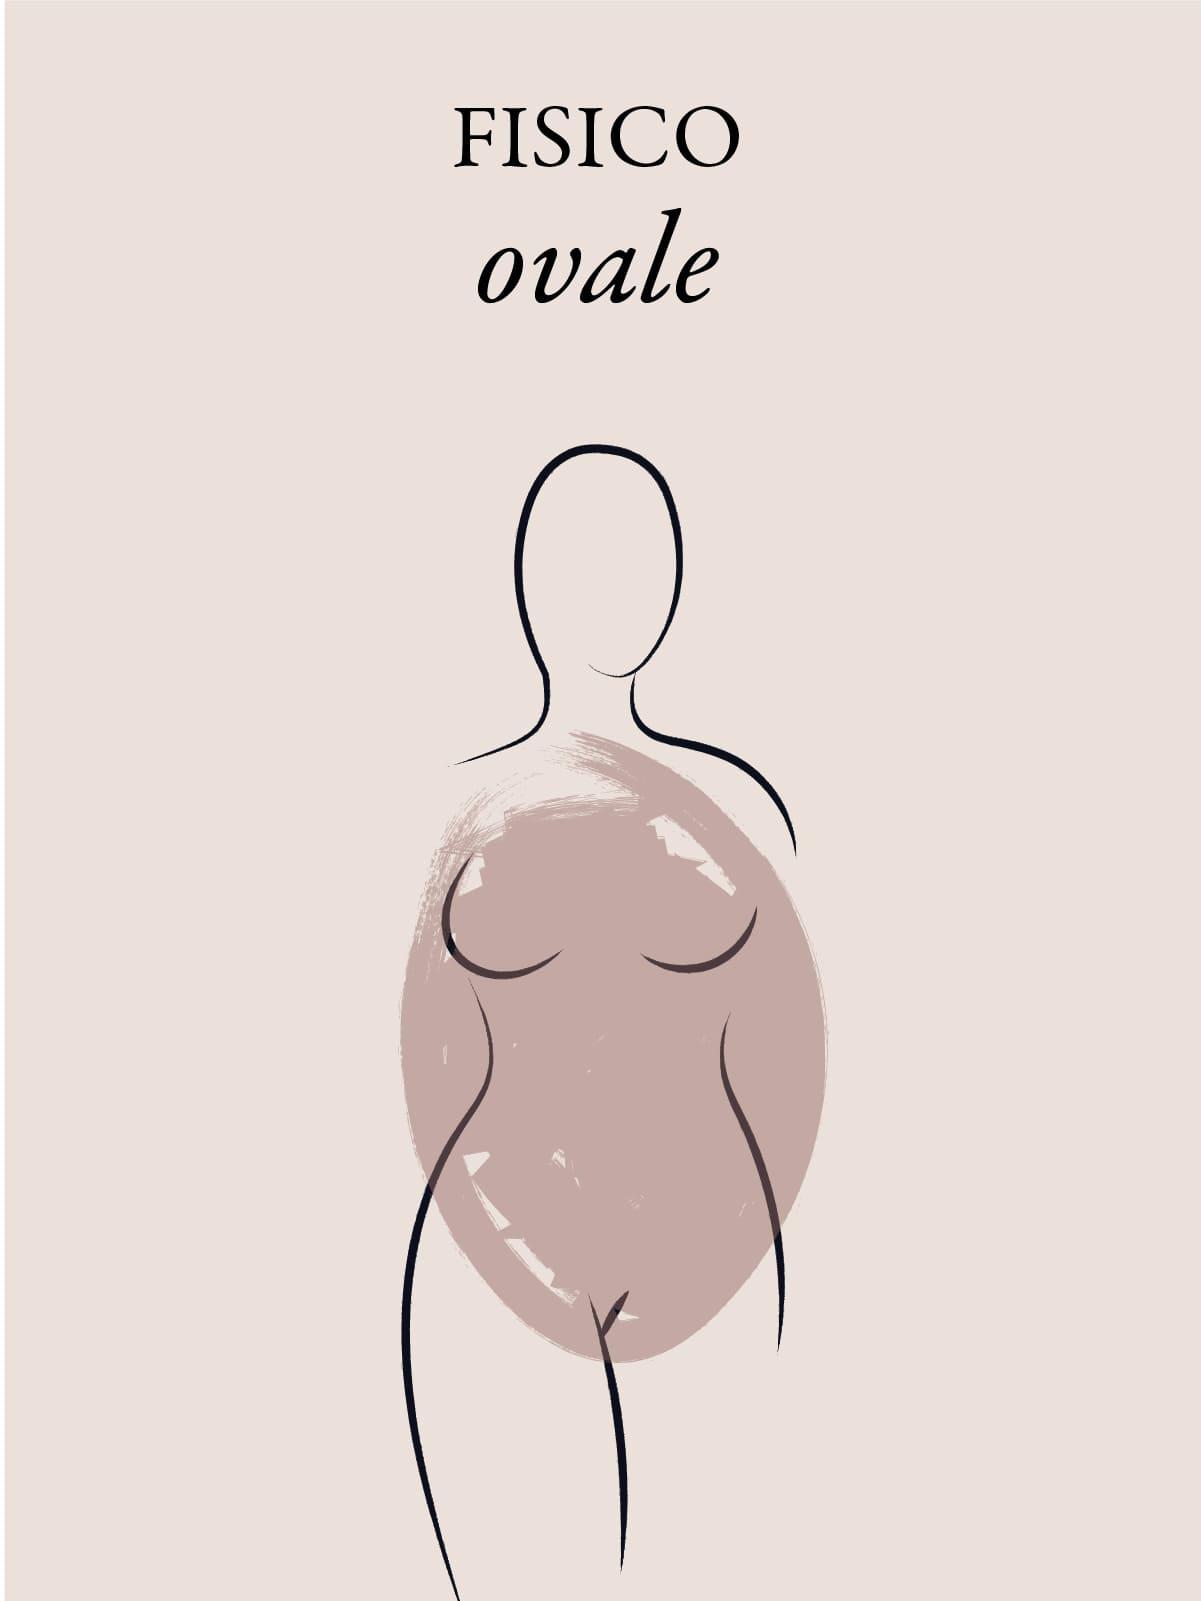 Com'è un corpo ovale?